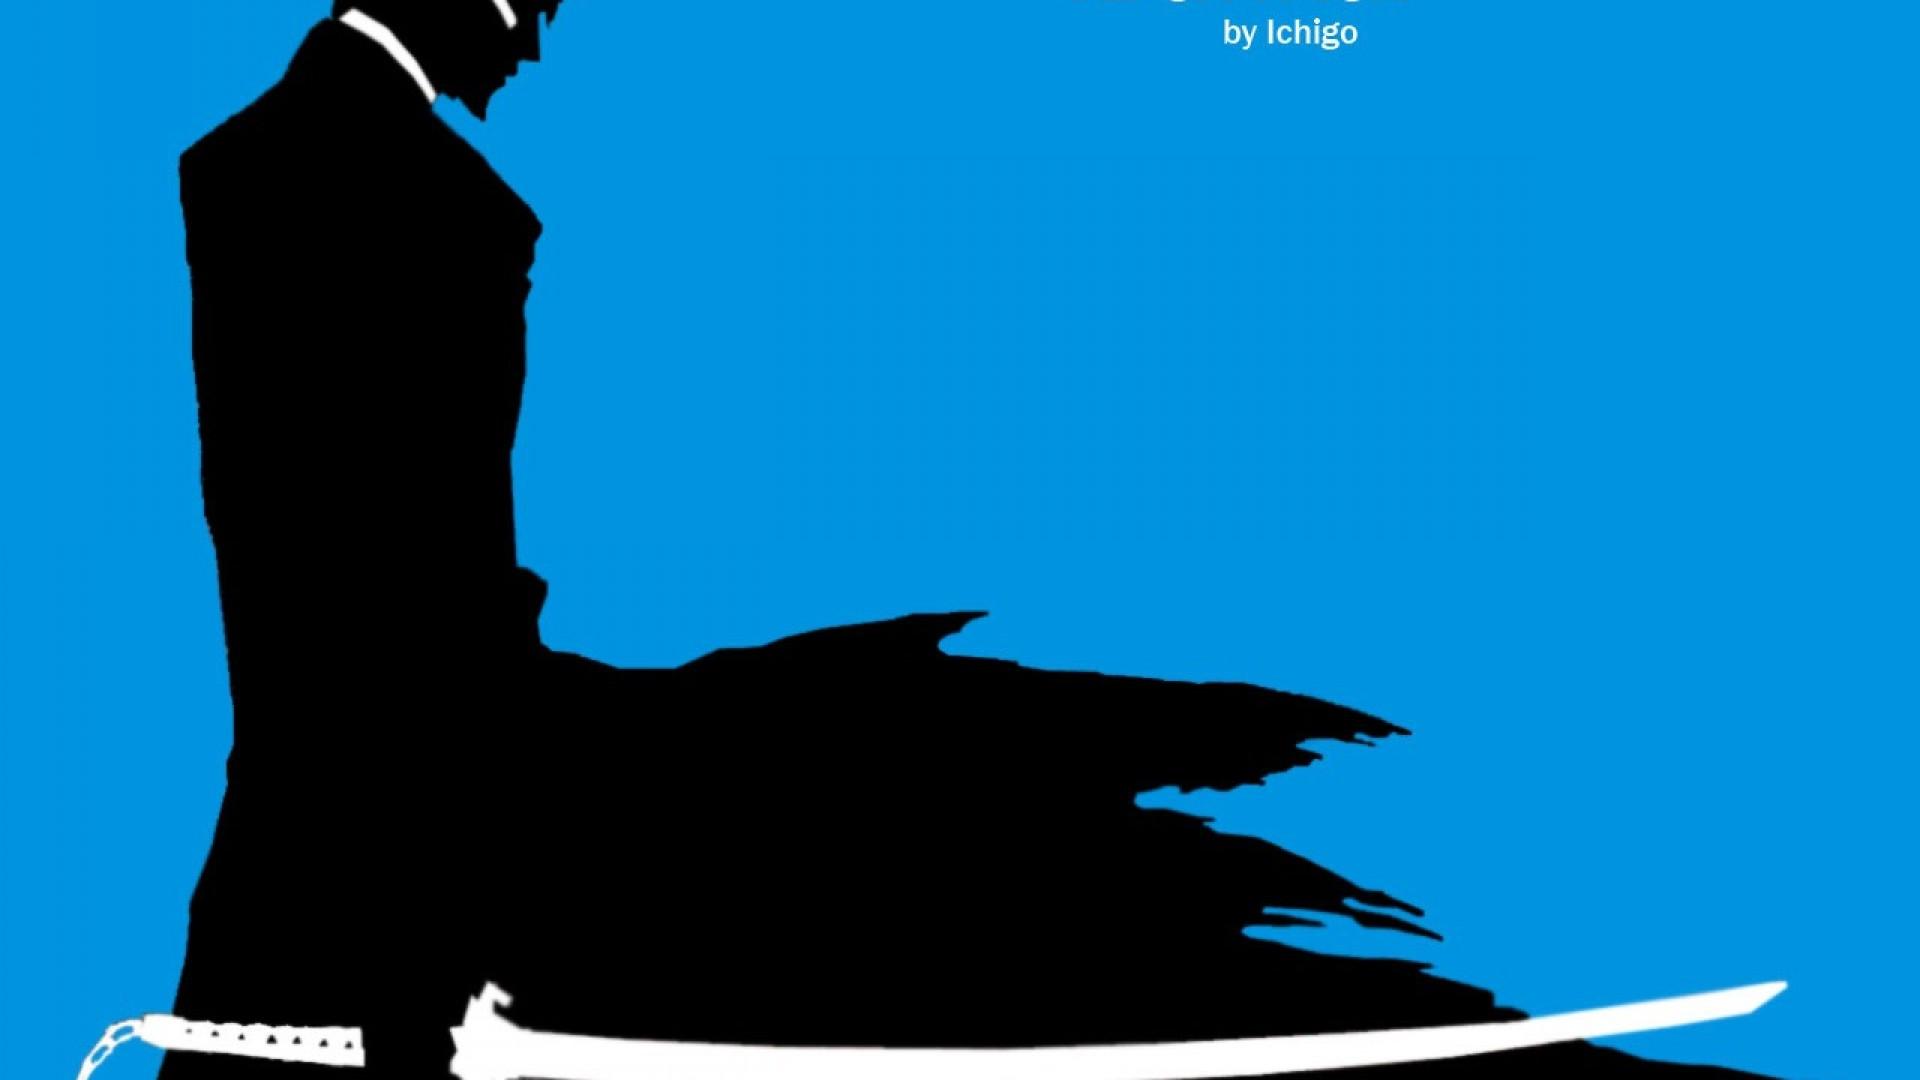 1920x1080 Screenheaven Bleach Kurosaki Ichigo Ipod Silhouettes Simple